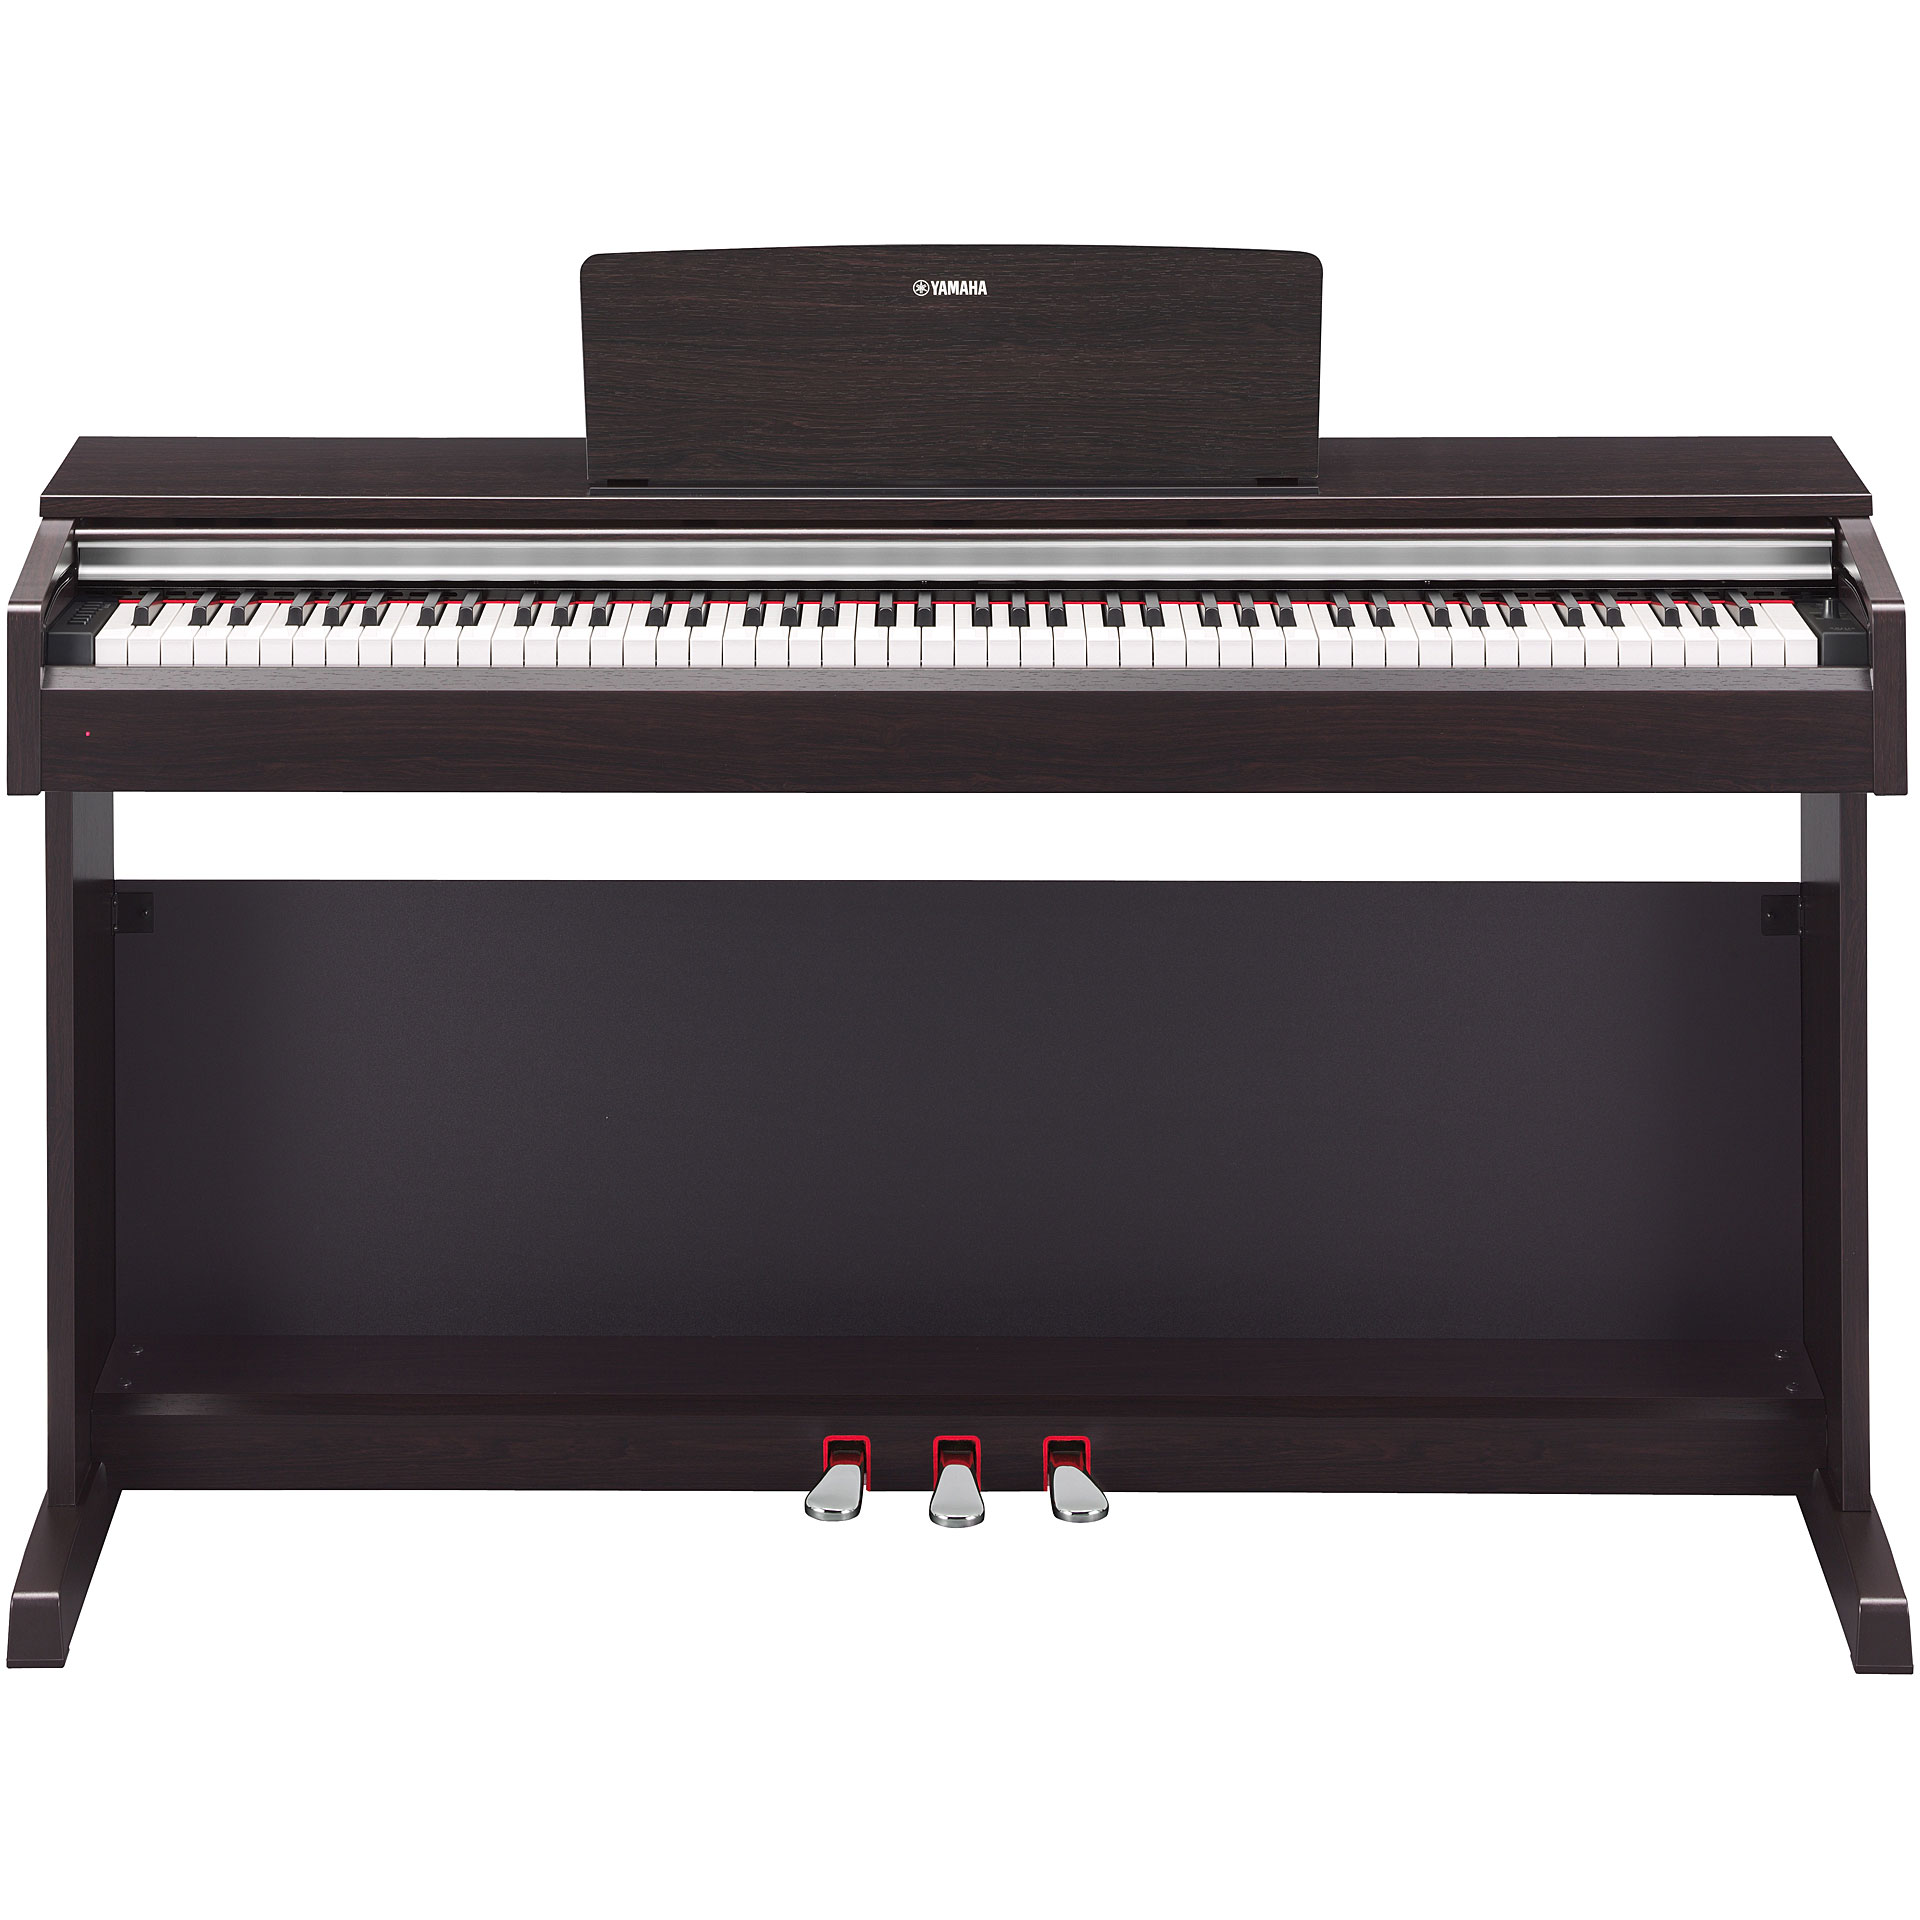 yamaha arius ydp 142 r digital piano. Black Bedroom Furniture Sets. Home Design Ideas